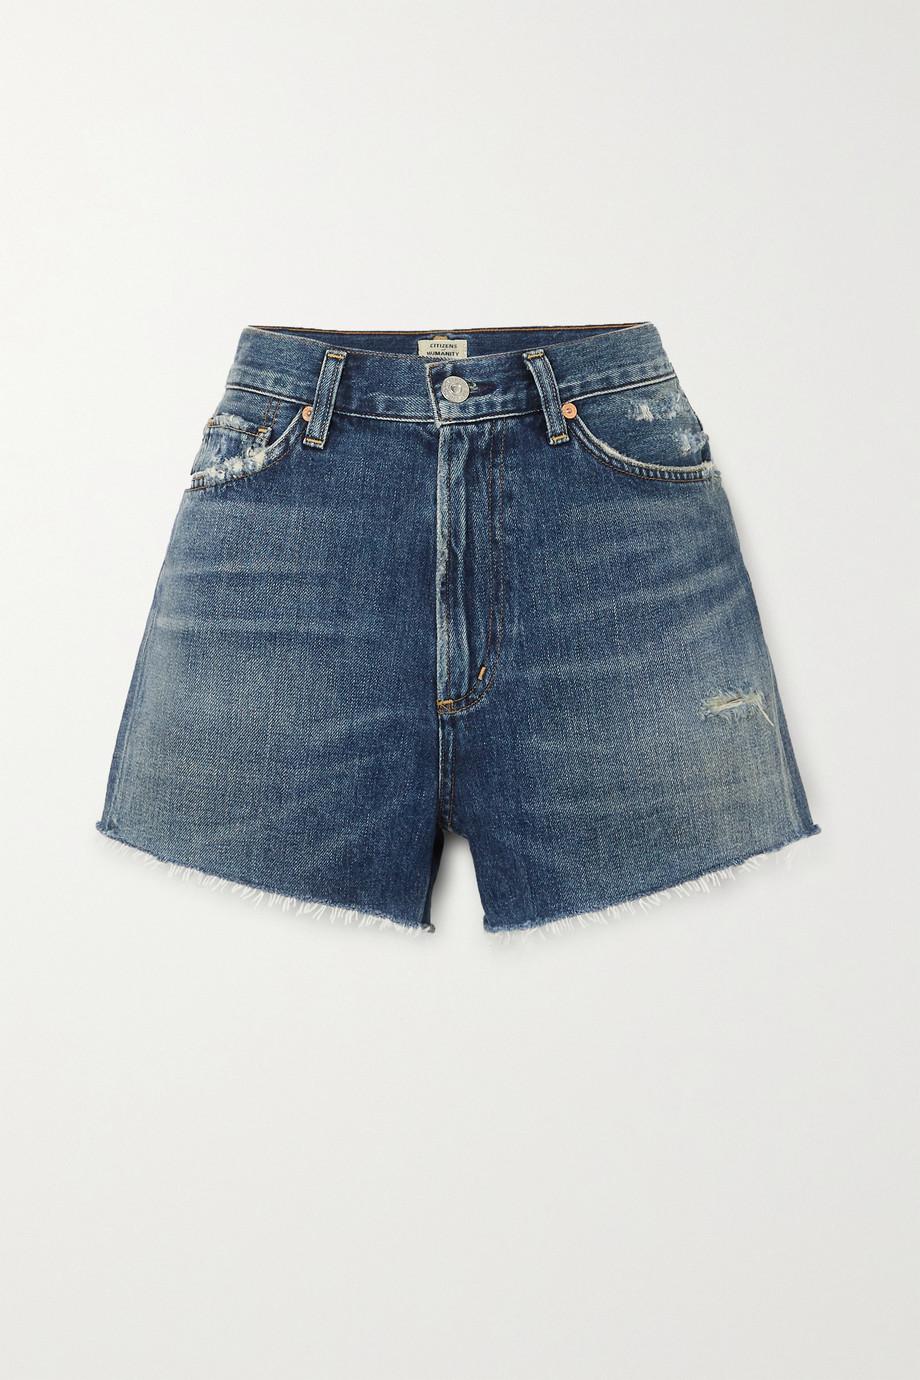 Citizens of Humanity Kristen frayed denim shorts